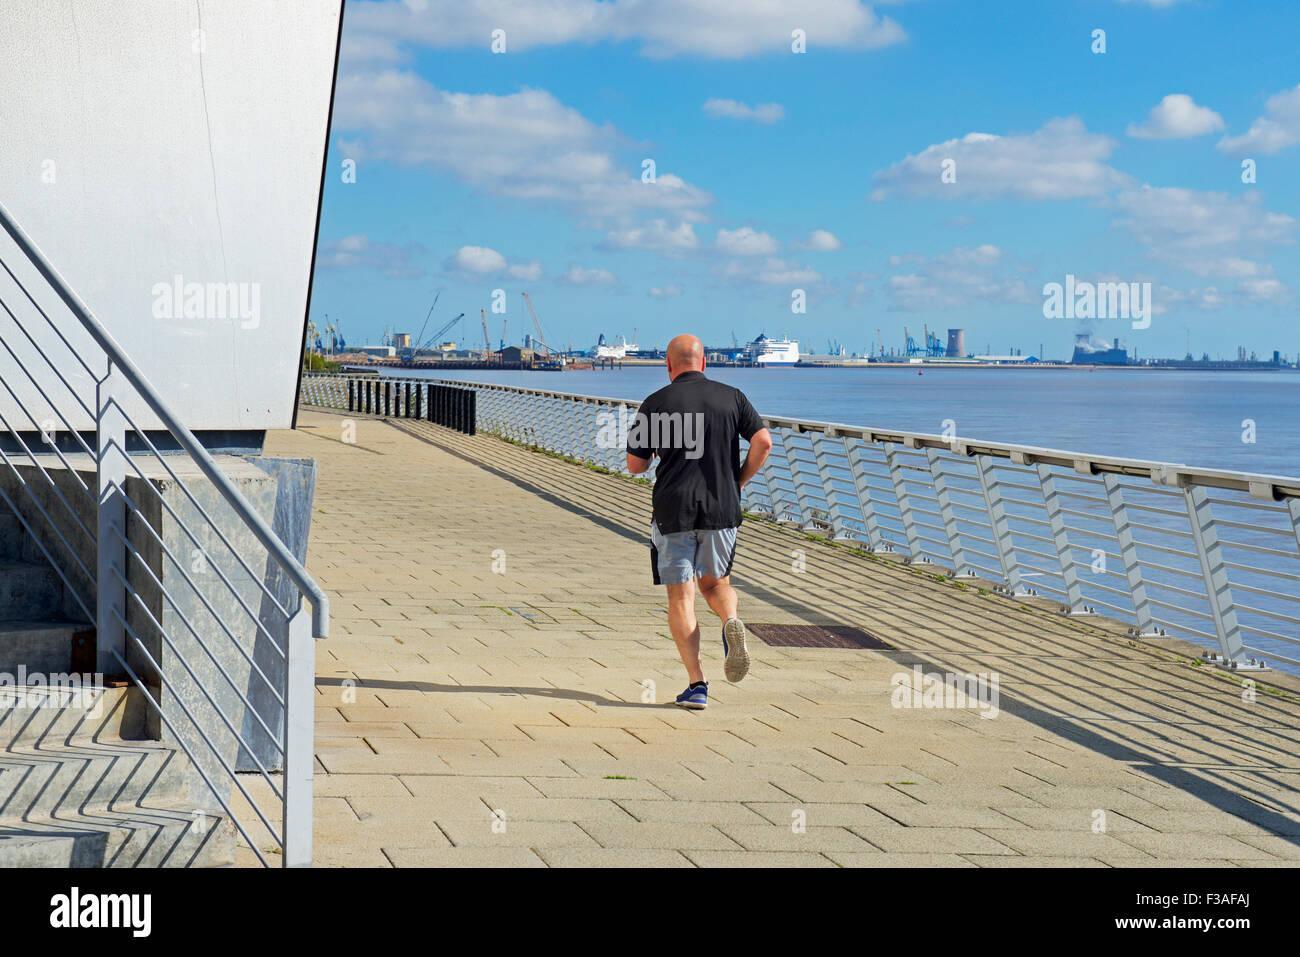 Man jogging on the promenade, Kingston upon Hull, East Riding of Yorkshire, England UK - Stock Image